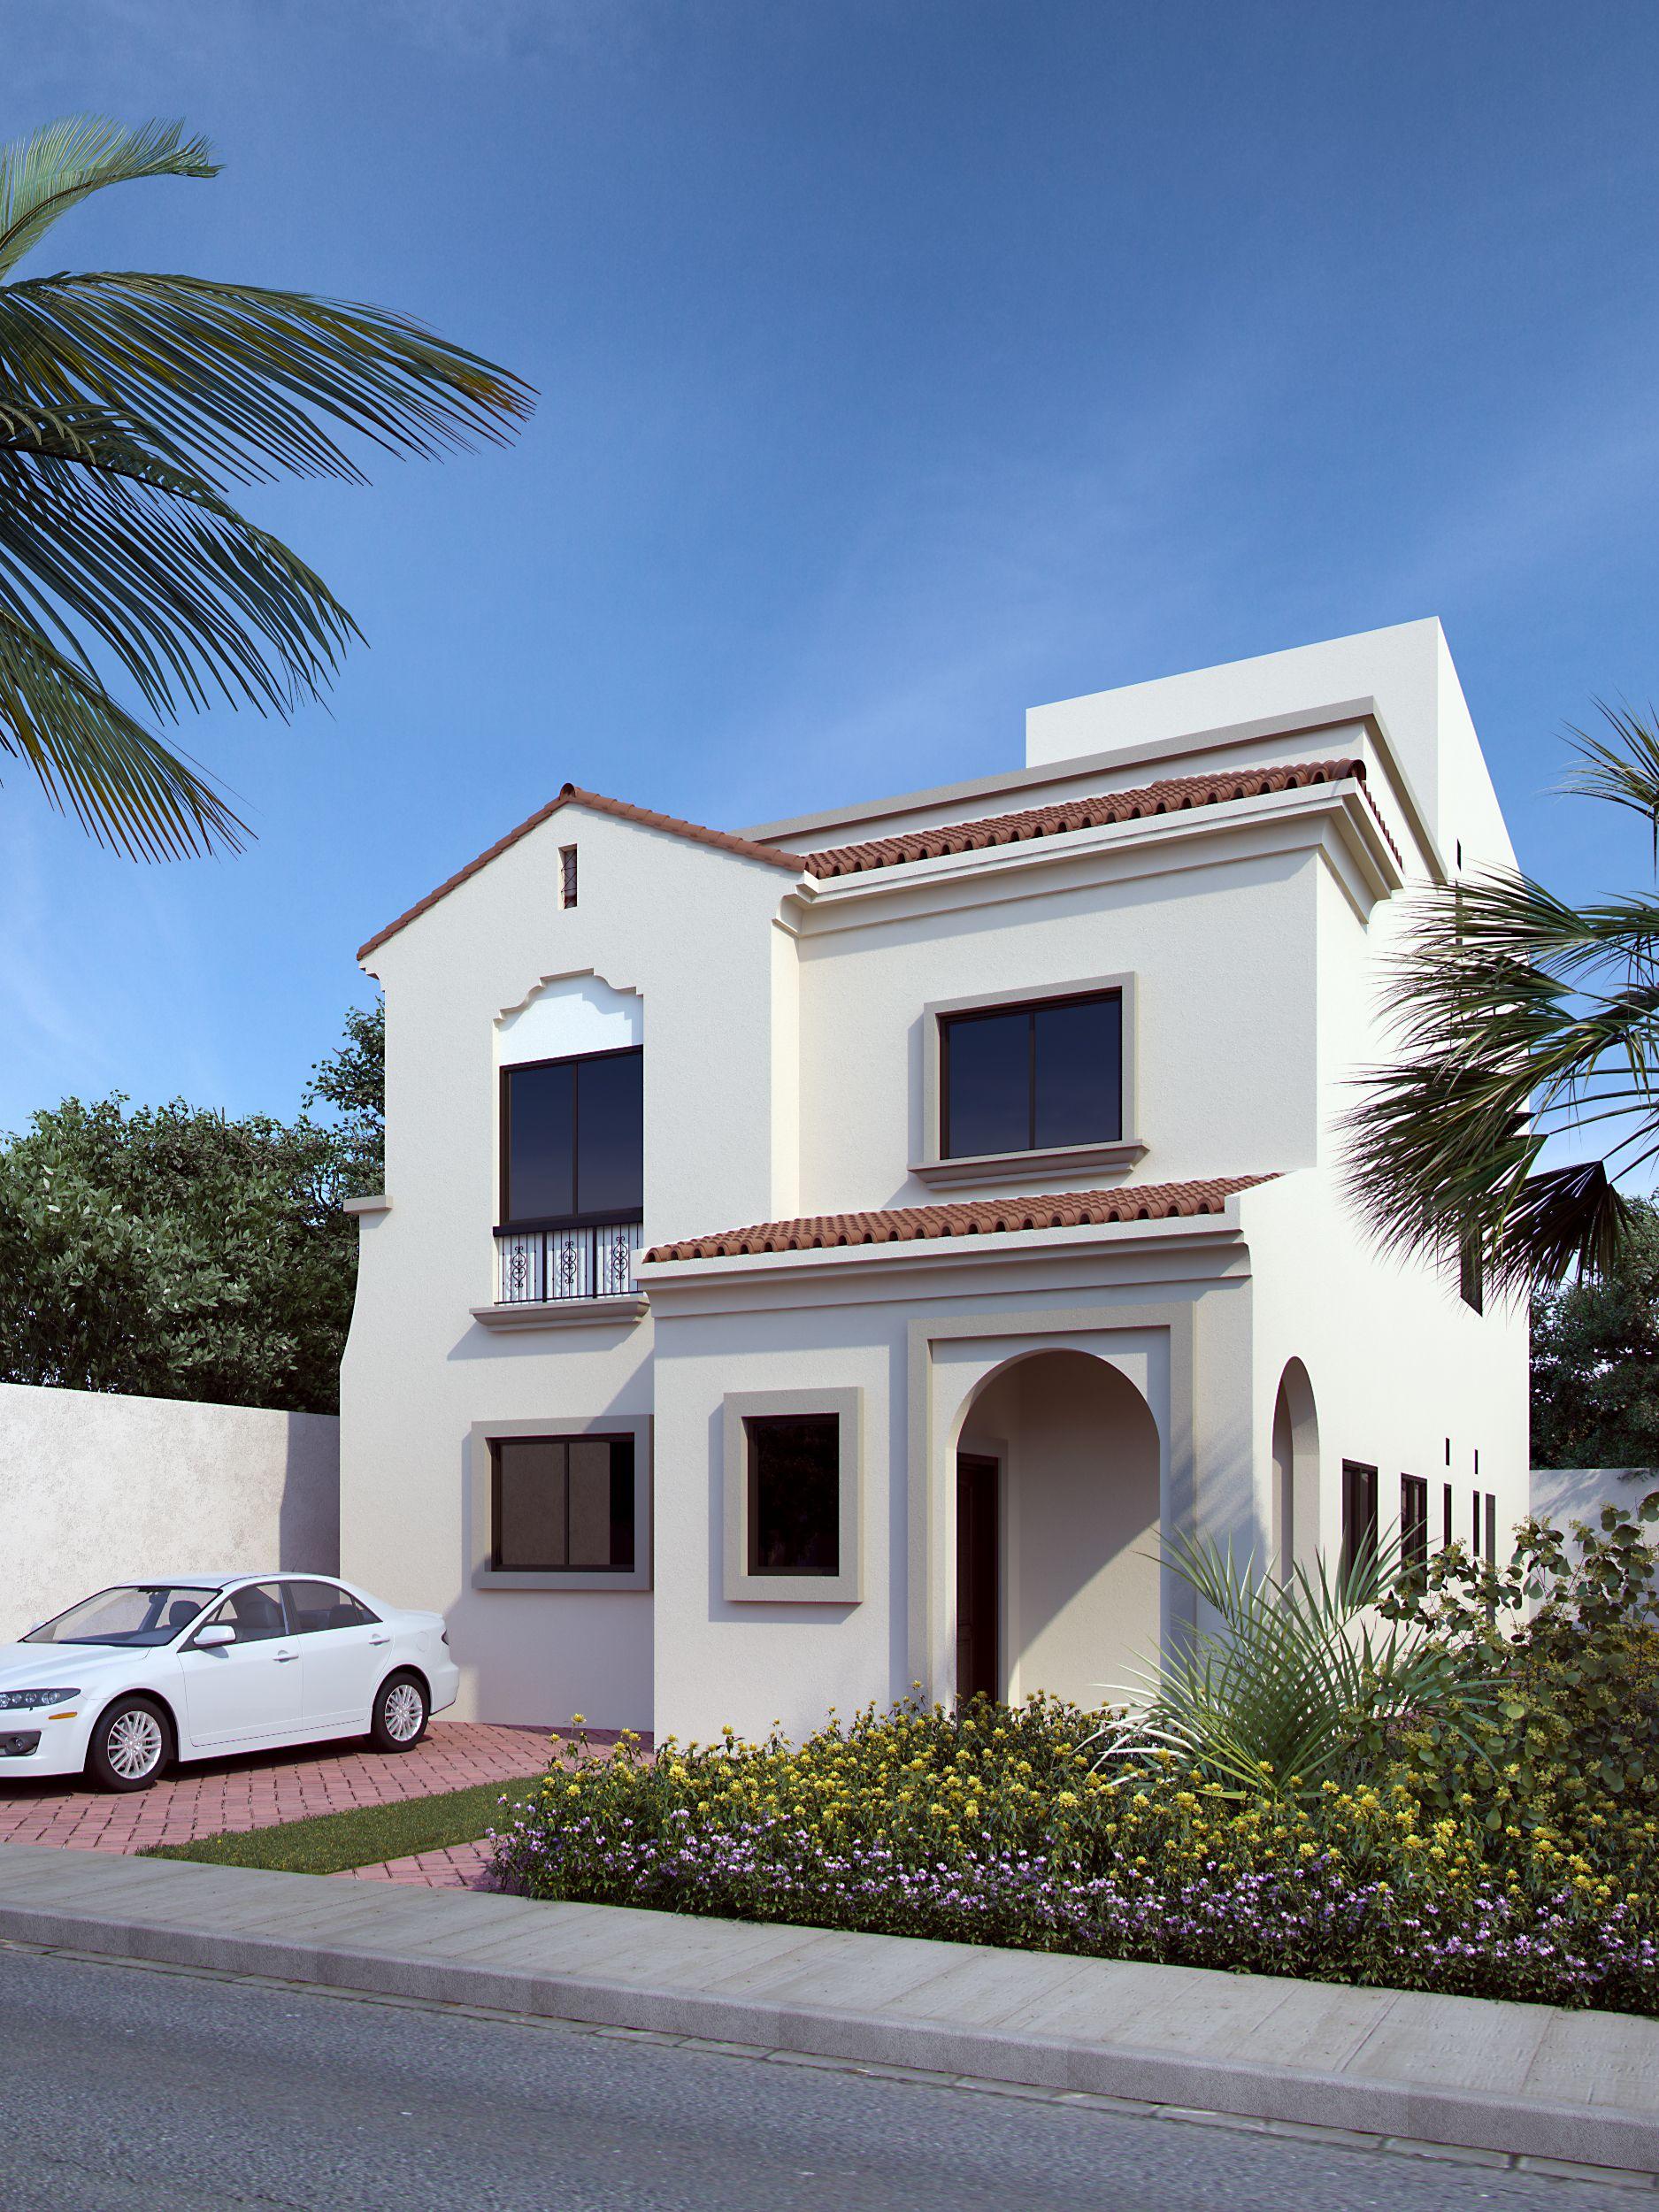 Proposed 3d photo rendering of spanish style villa villa for Spanish villa house